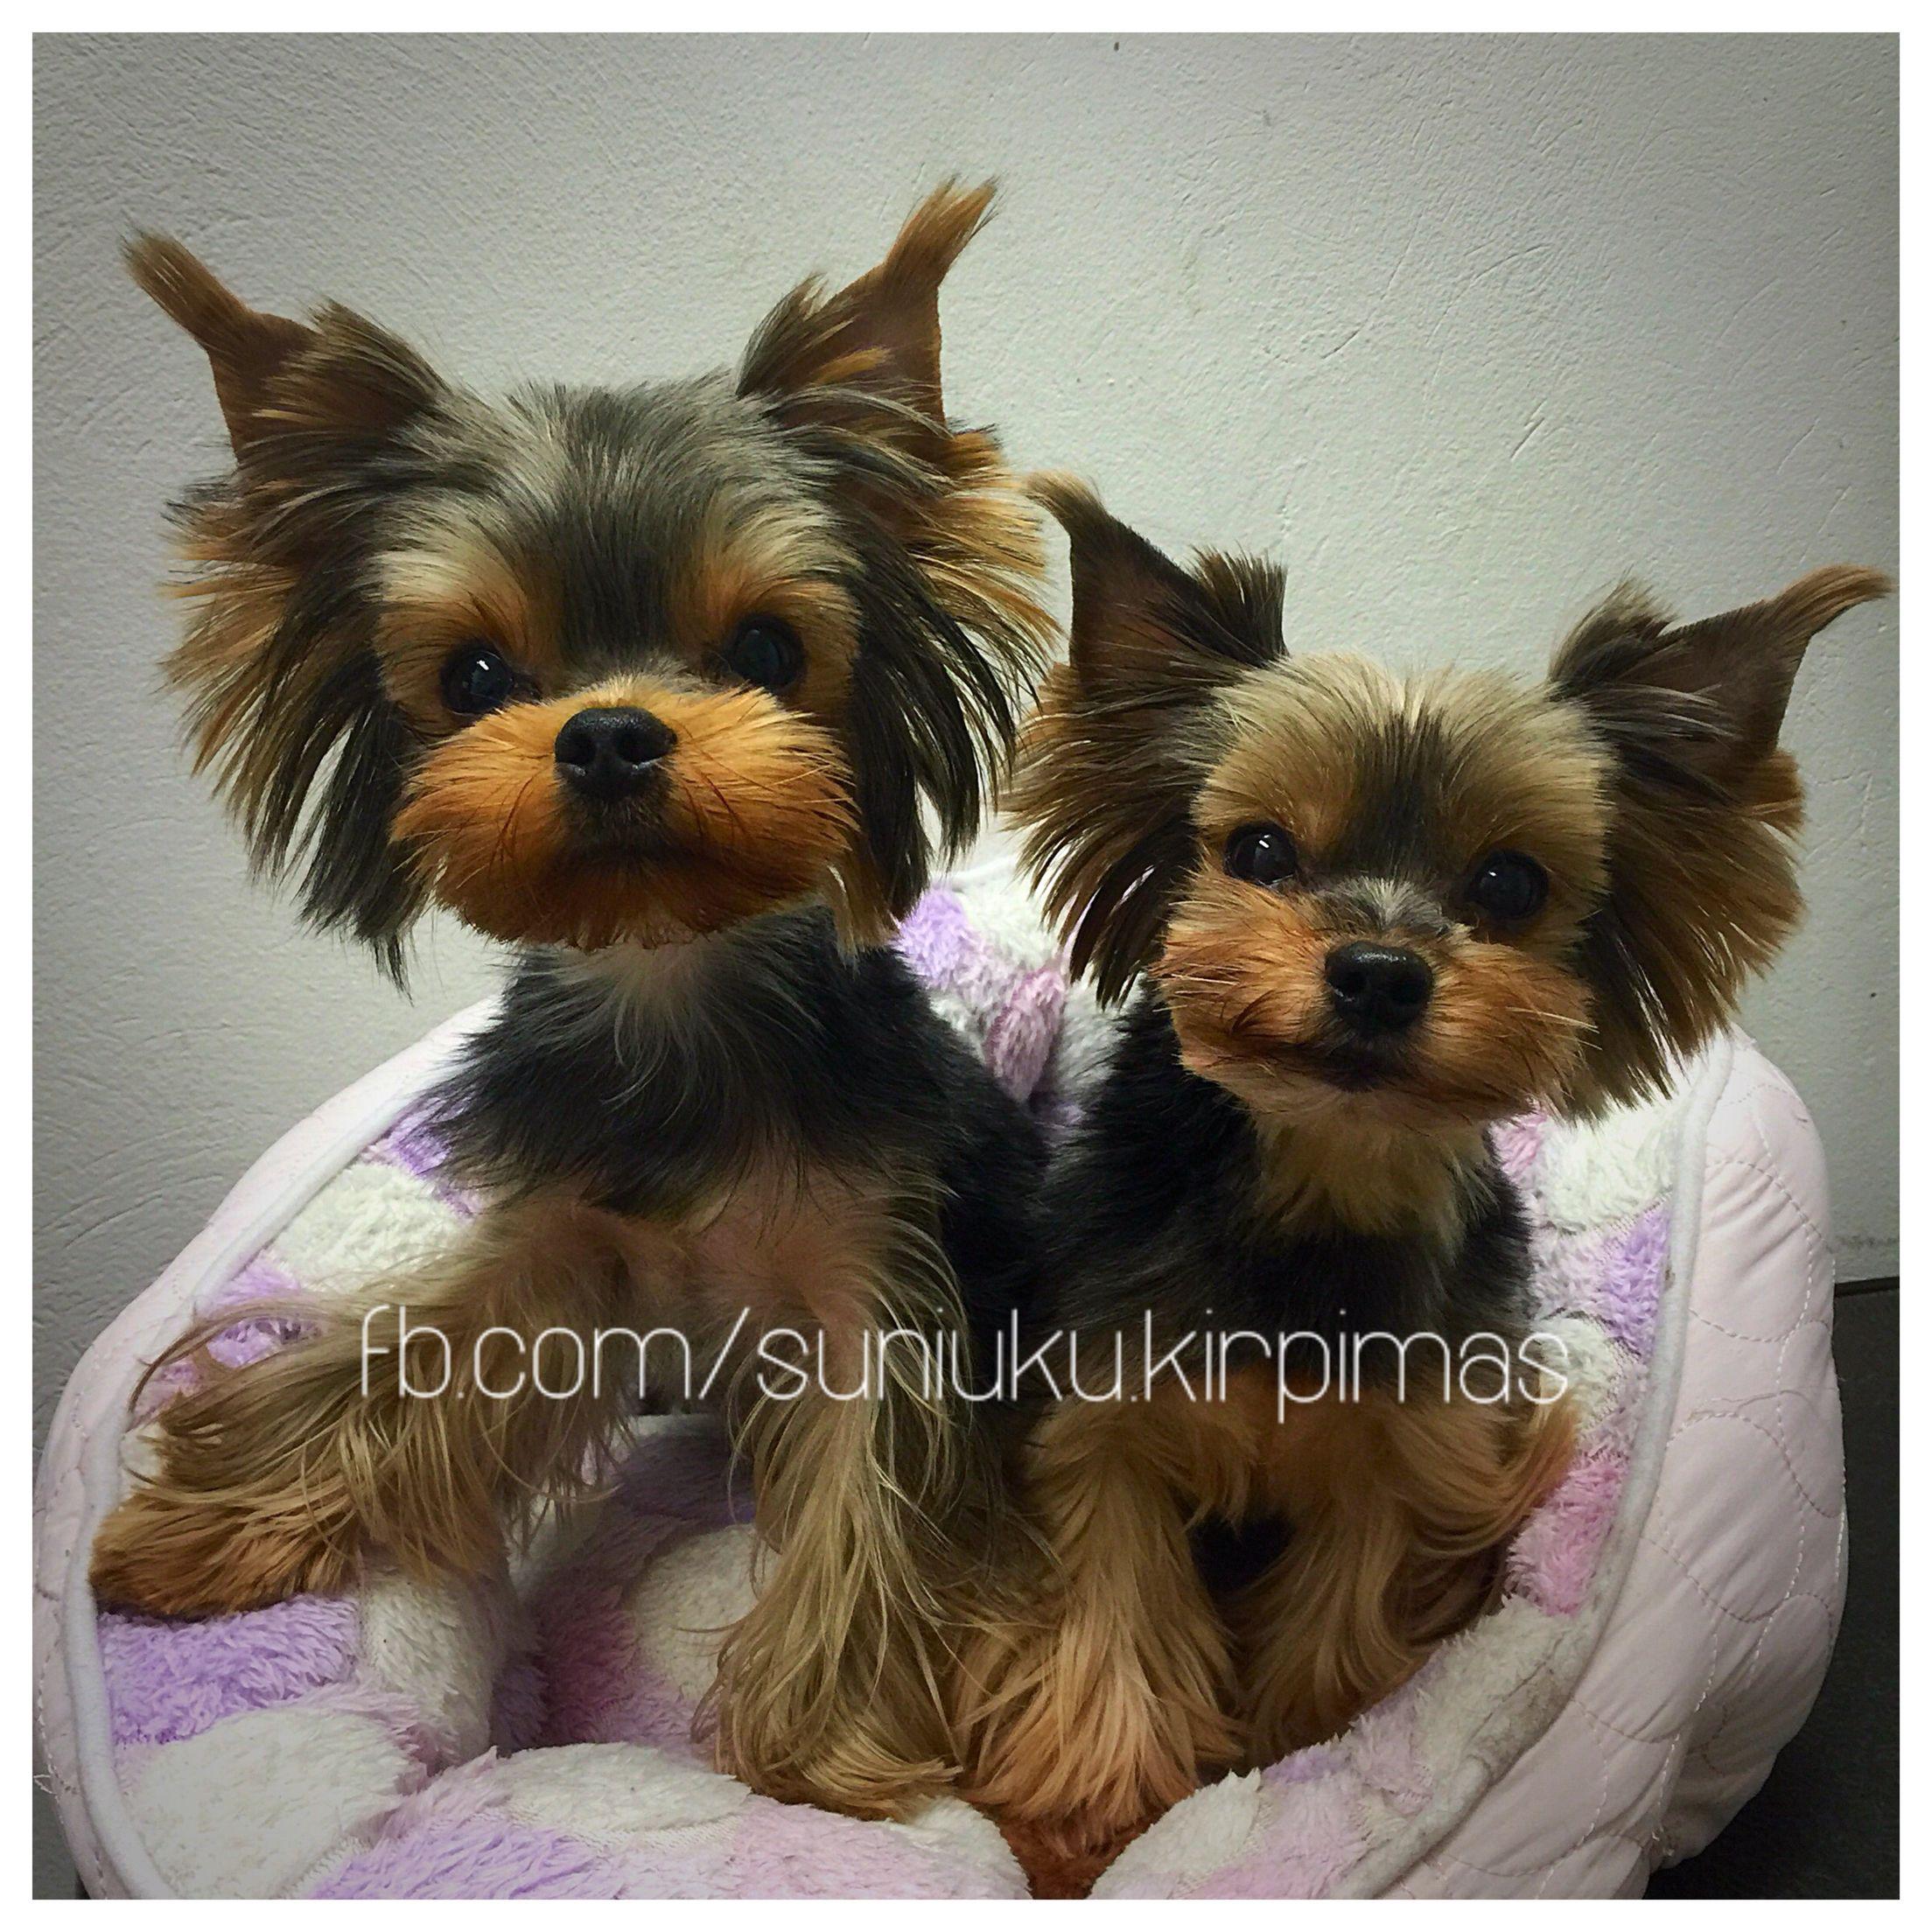 Asian Fusion Squirrel Ears Groomed By Vytenė Kazakaitė More Photos At Www Facebook Com Suniuku Kirpimas Yorkie Yorkie Terrier Yorkie Puppy